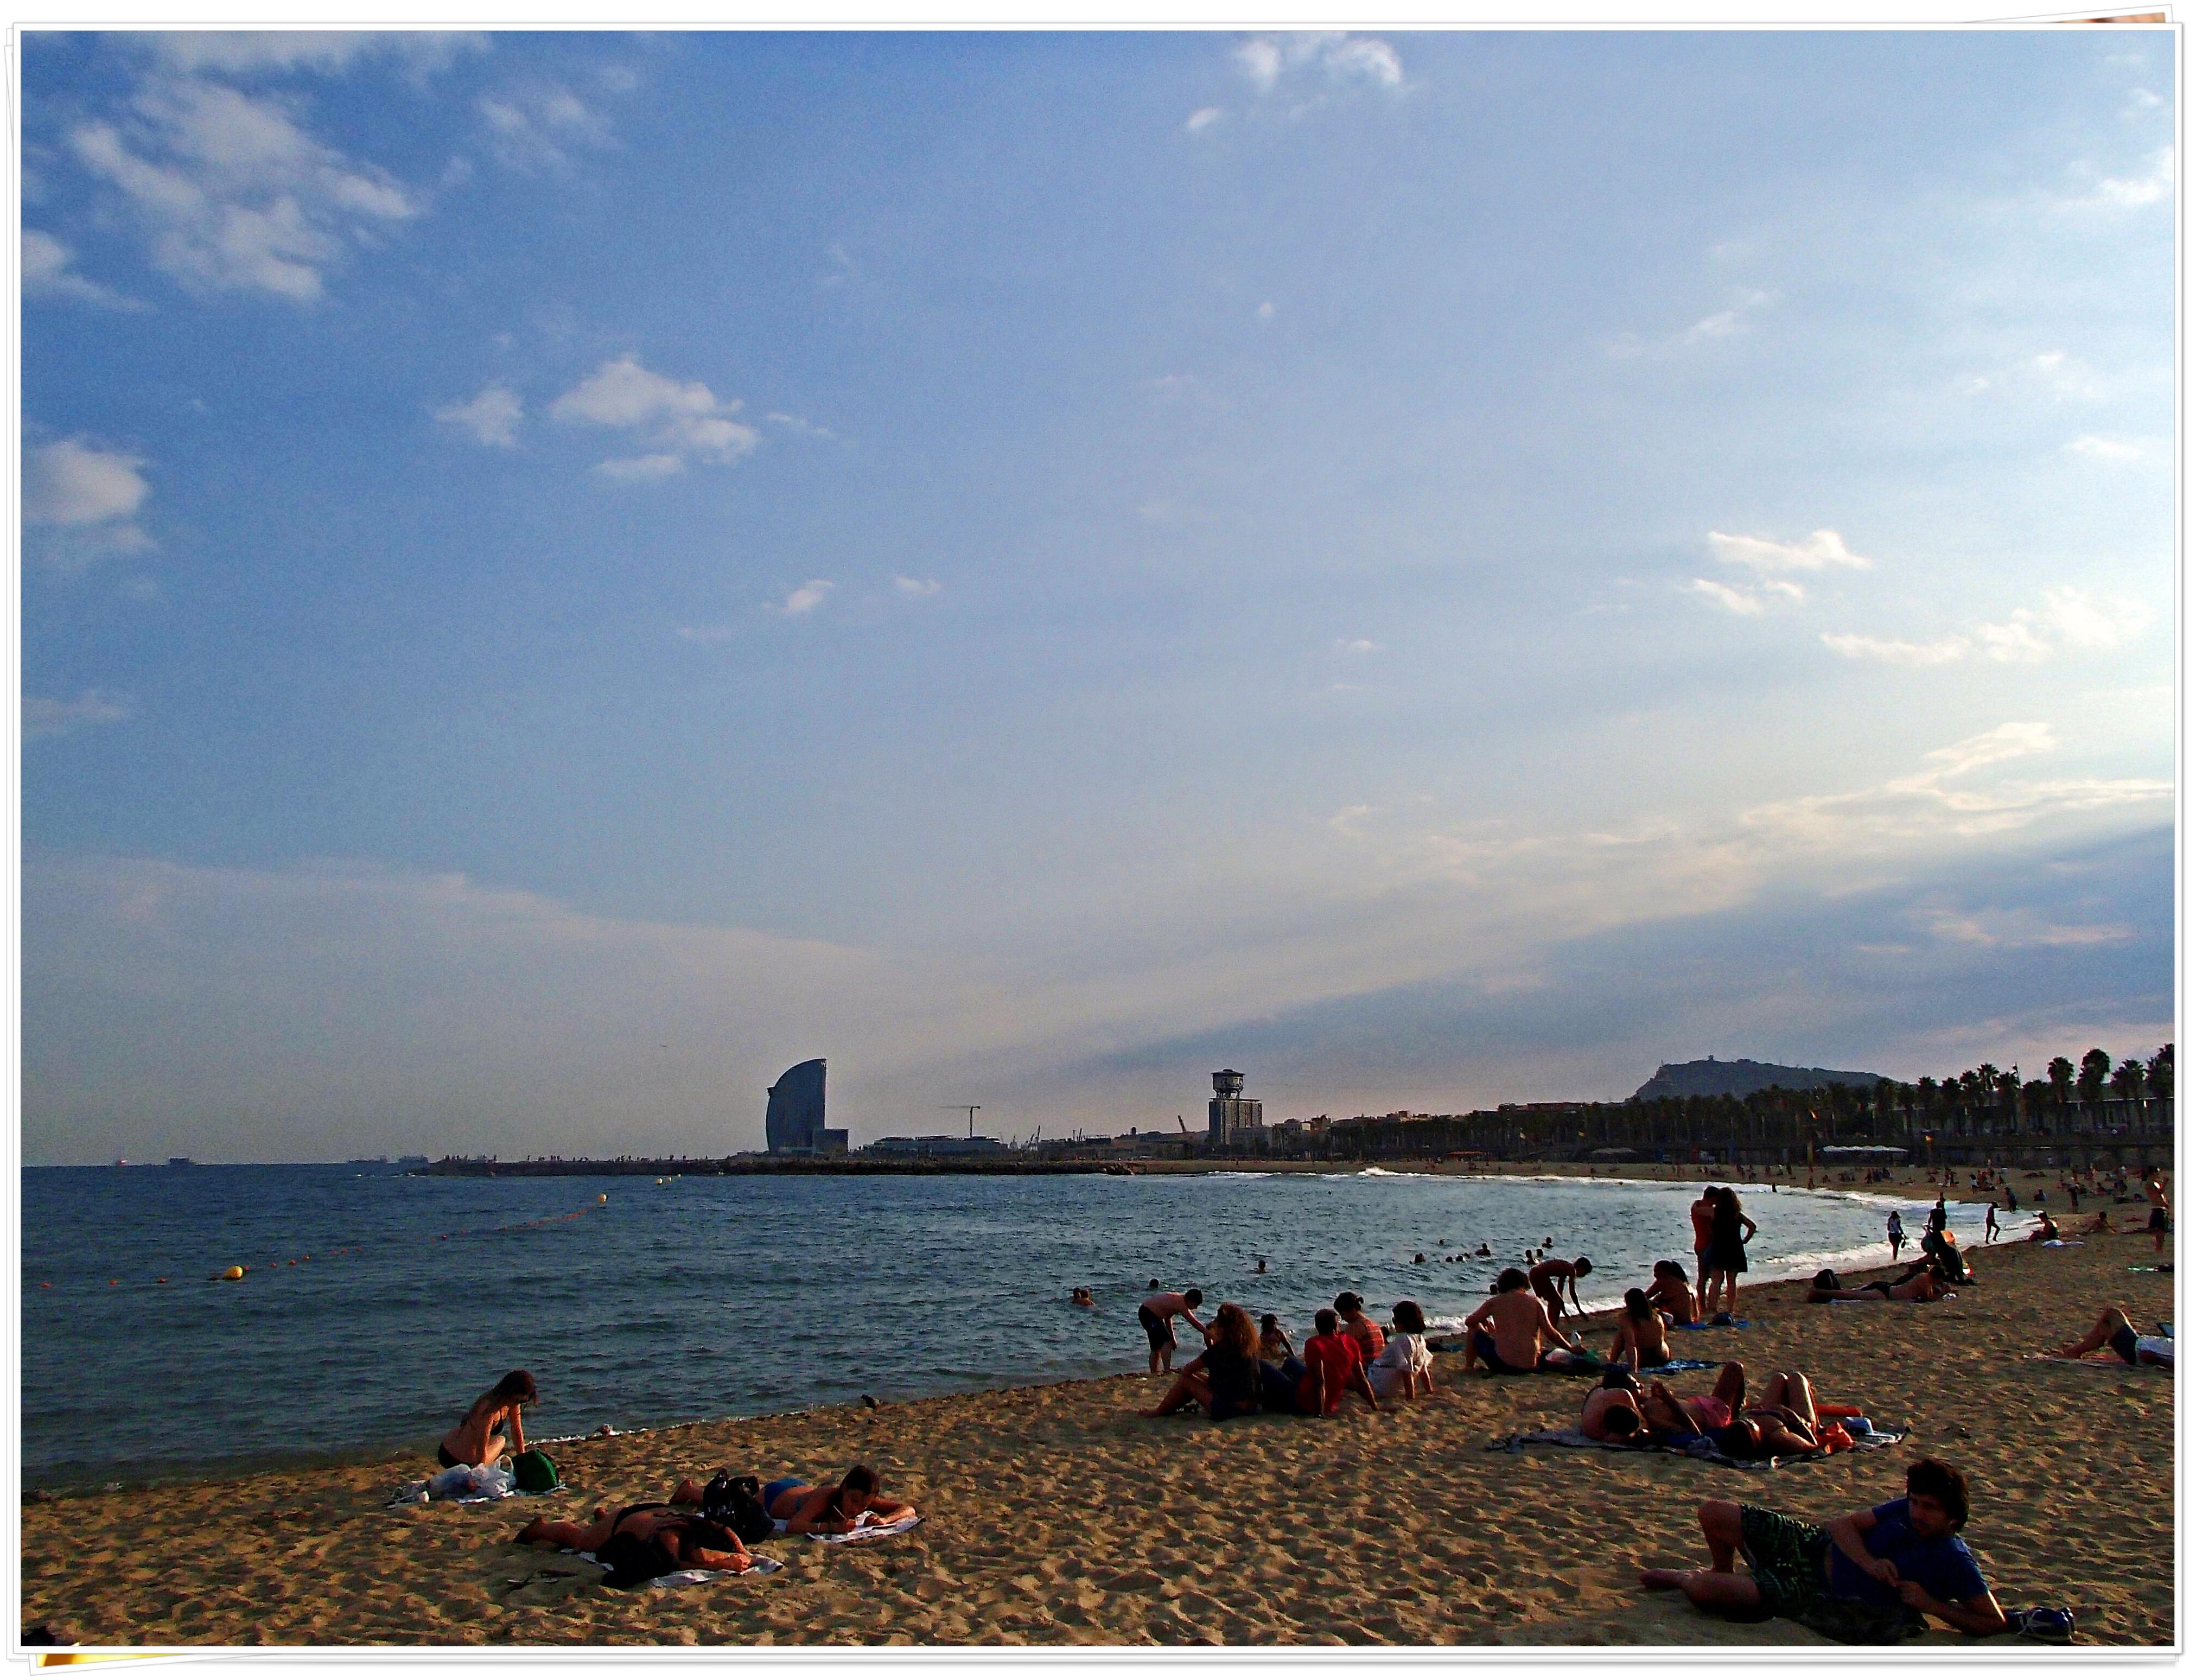 Spain_Barcelona 2013 - 19